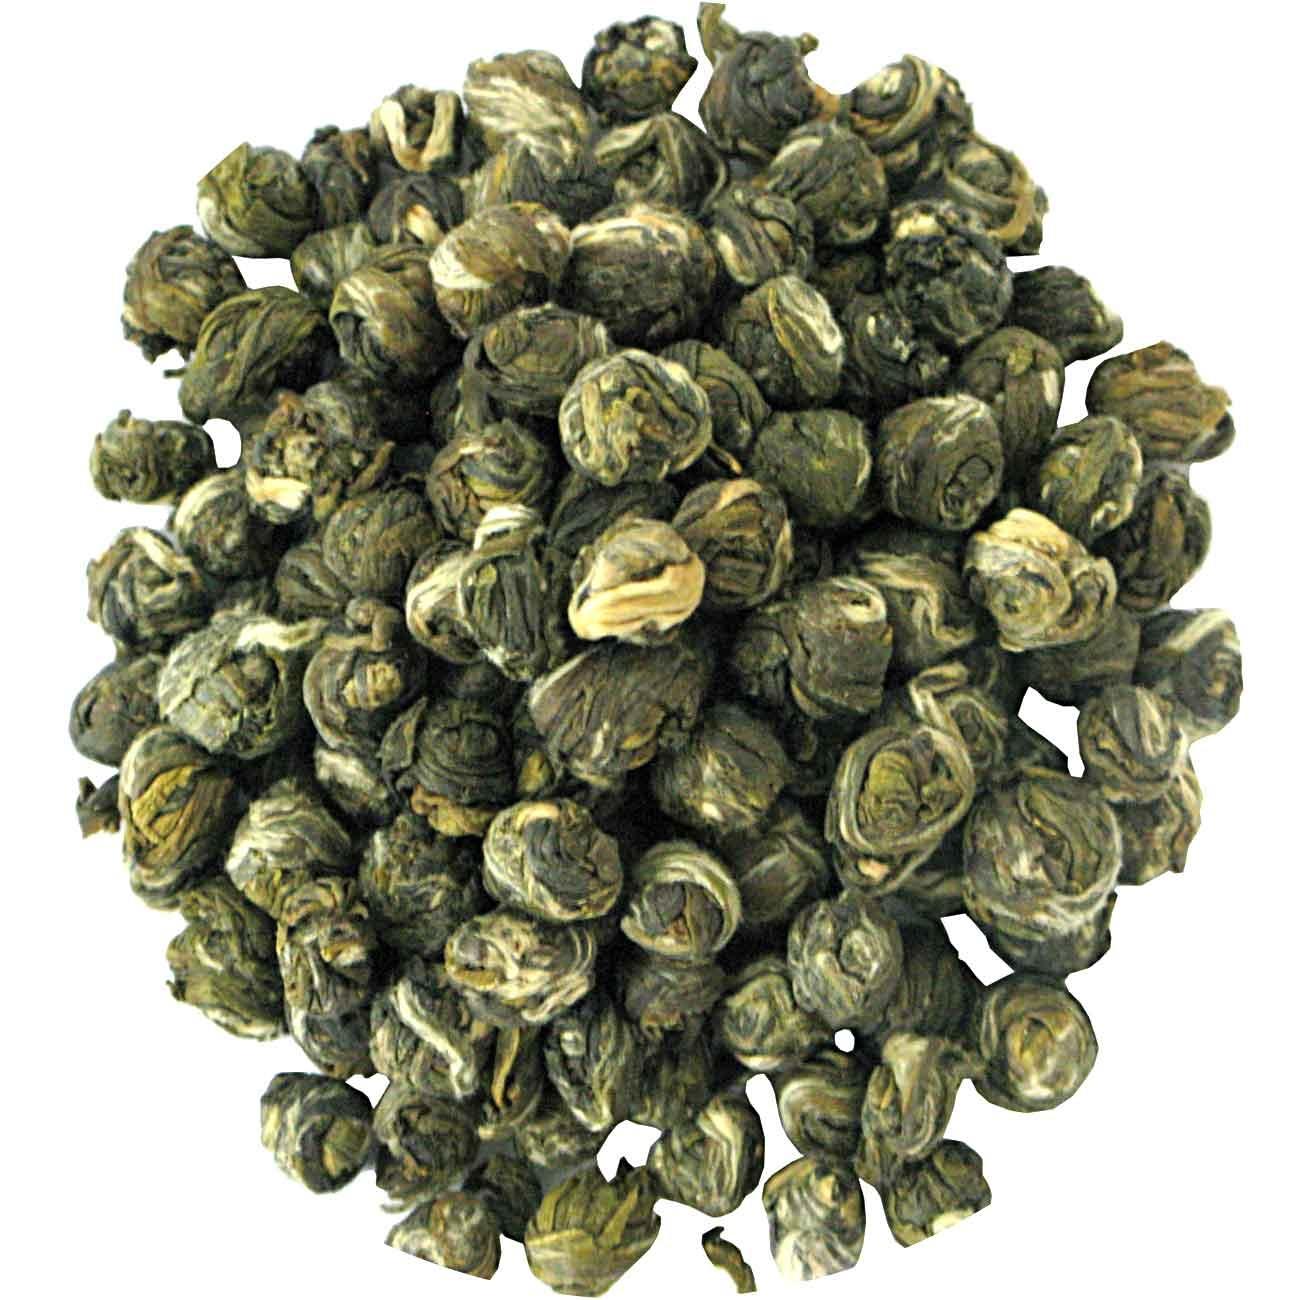 China Jasmijn Dragon Pearl thee